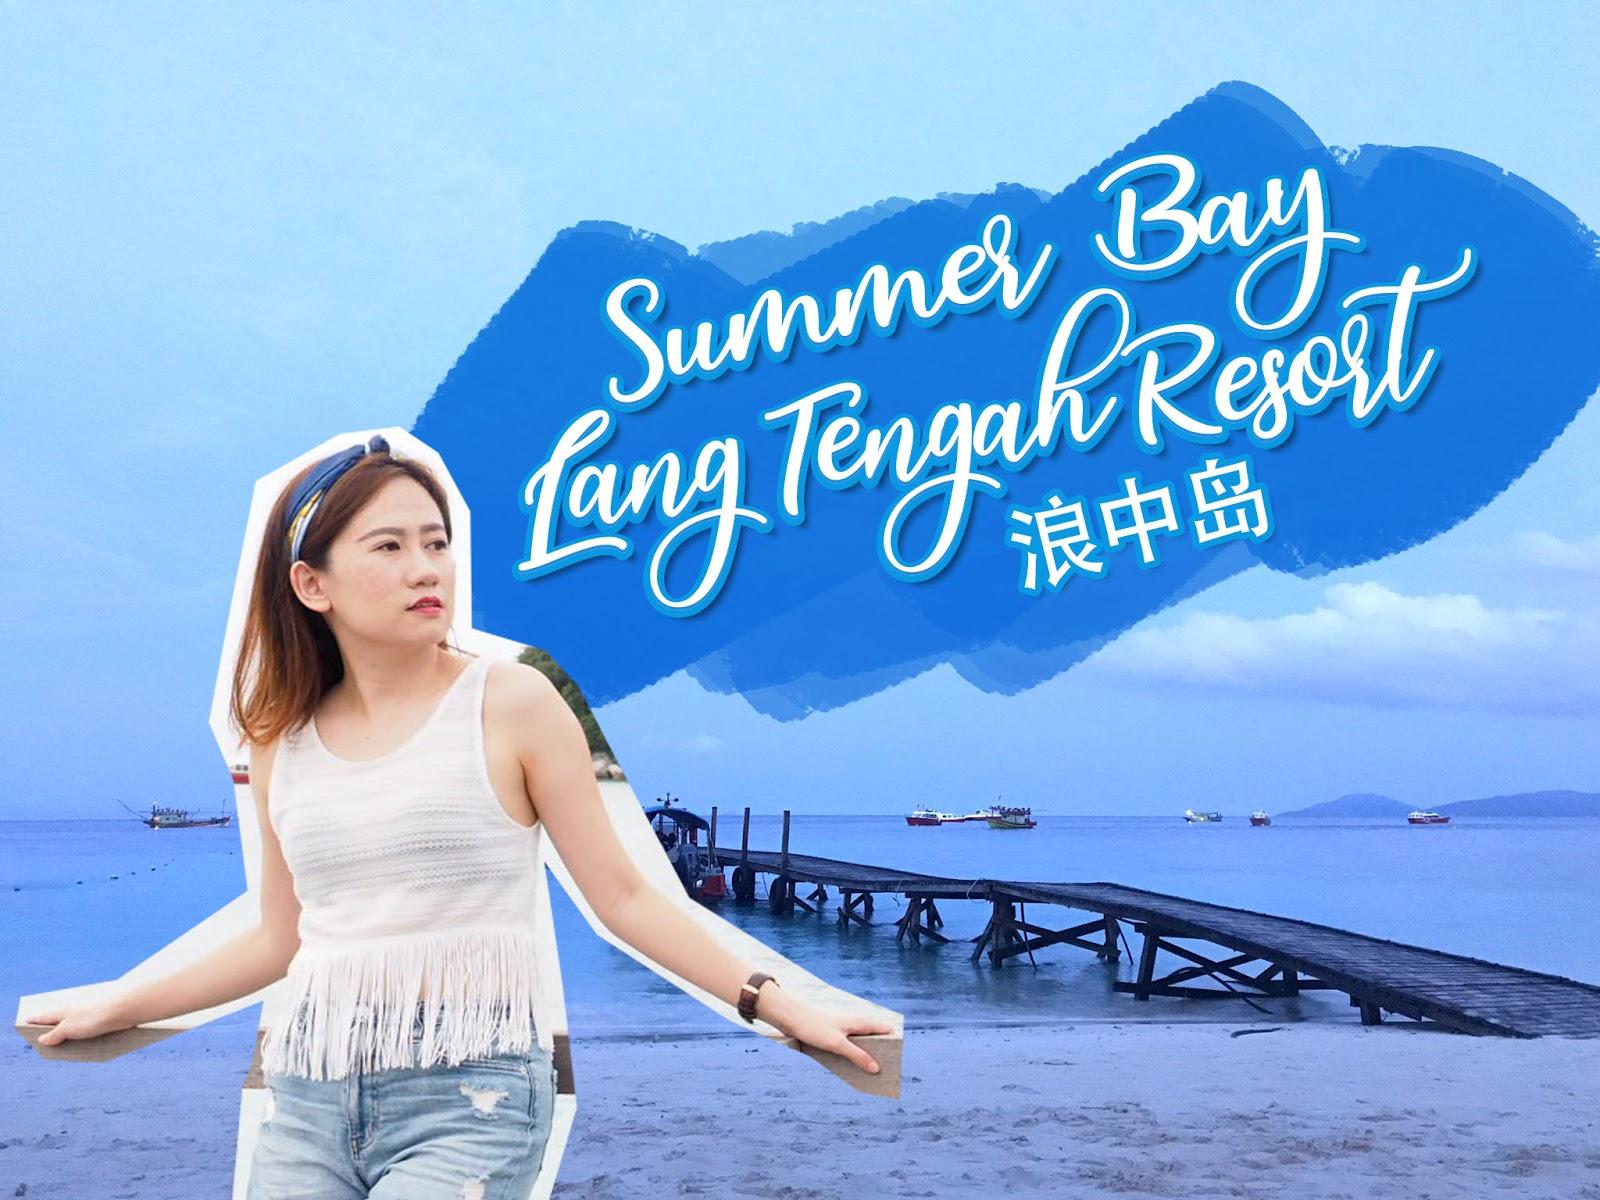 [Travel] 3D2N Olympus Malaysia x Summer Bay Resort @ Lang Tengah Island, Terengganu, Malaysia